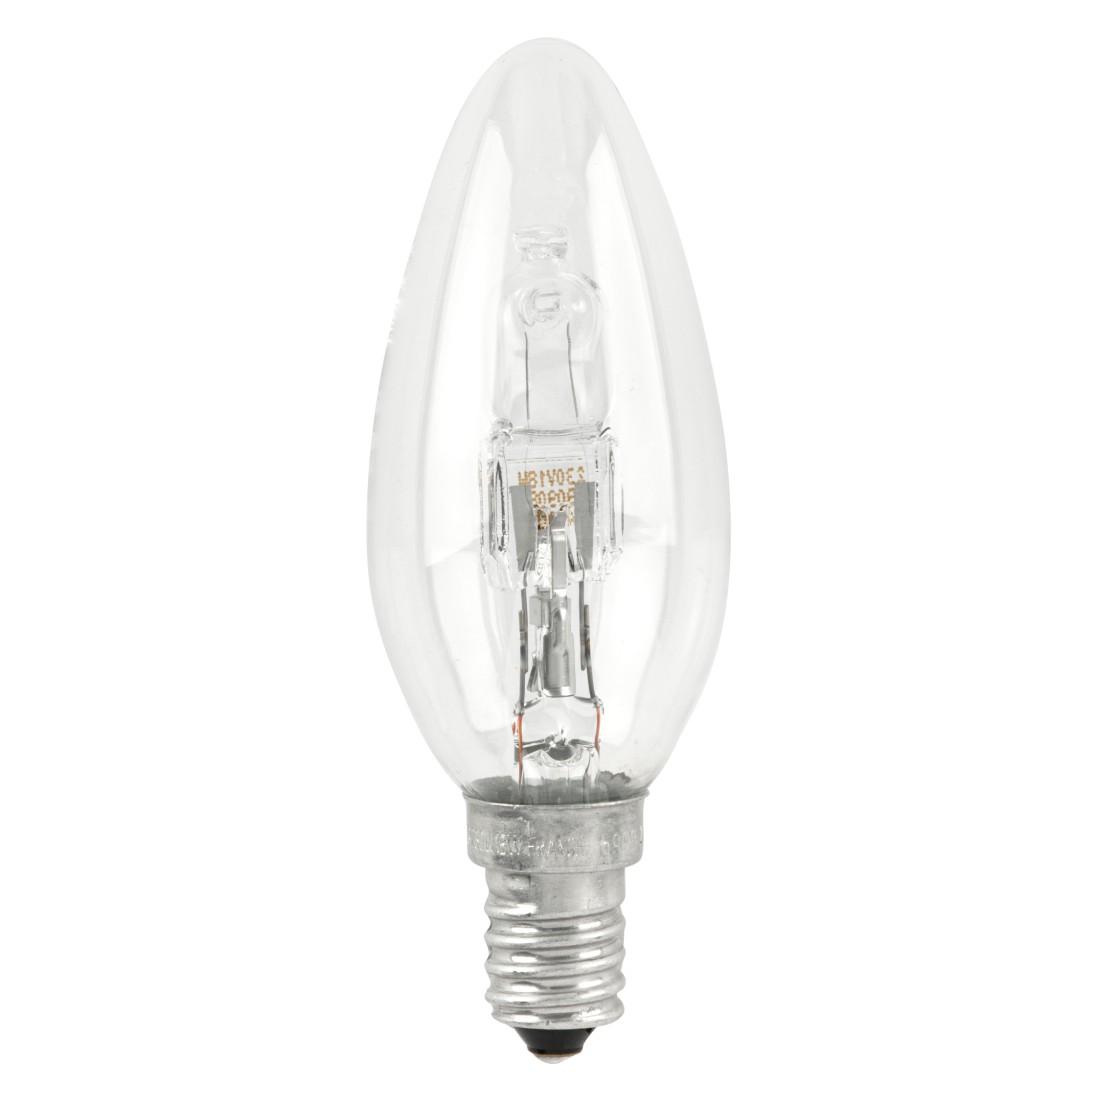 Halogen-Retrofitlampe E14 18 W Kerze klar ● Klarglas Klar- Mega Licht